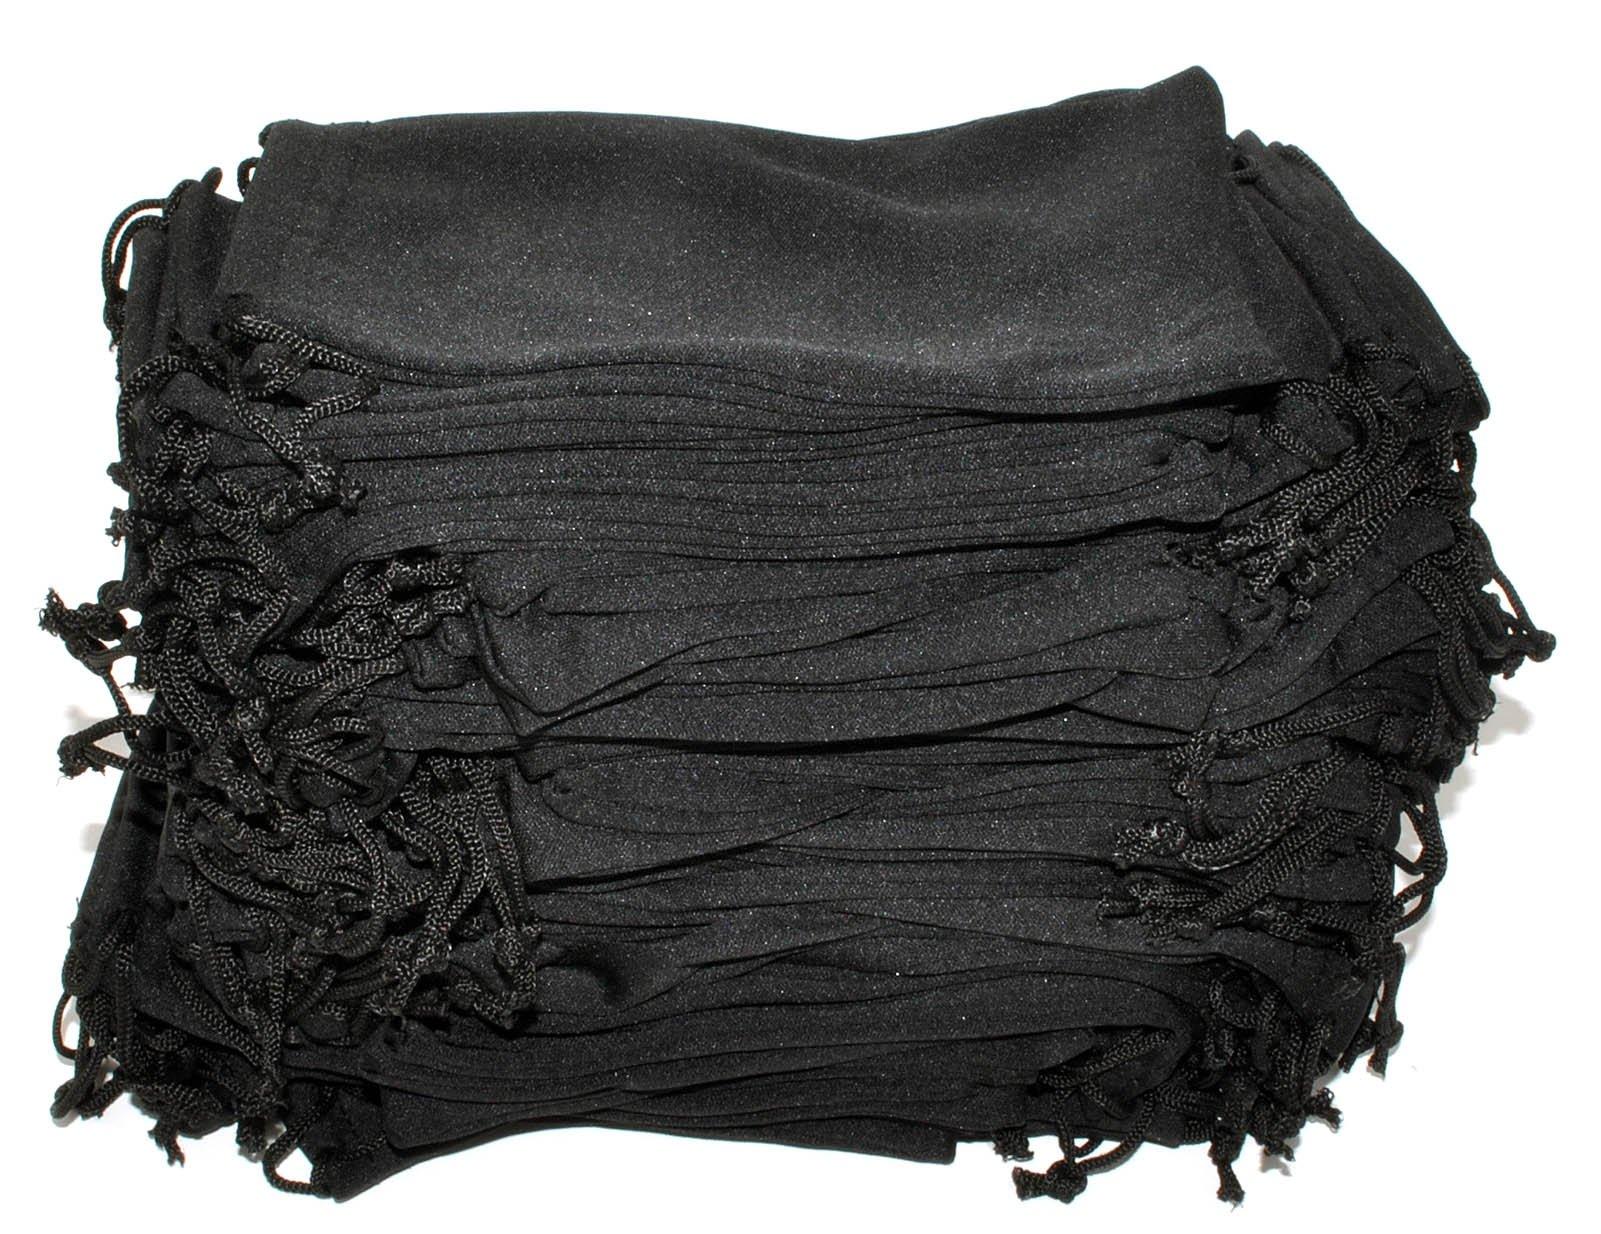 Wholesale Glasses Pouches Cleaning Case Bag Black 100 PCS by OWL